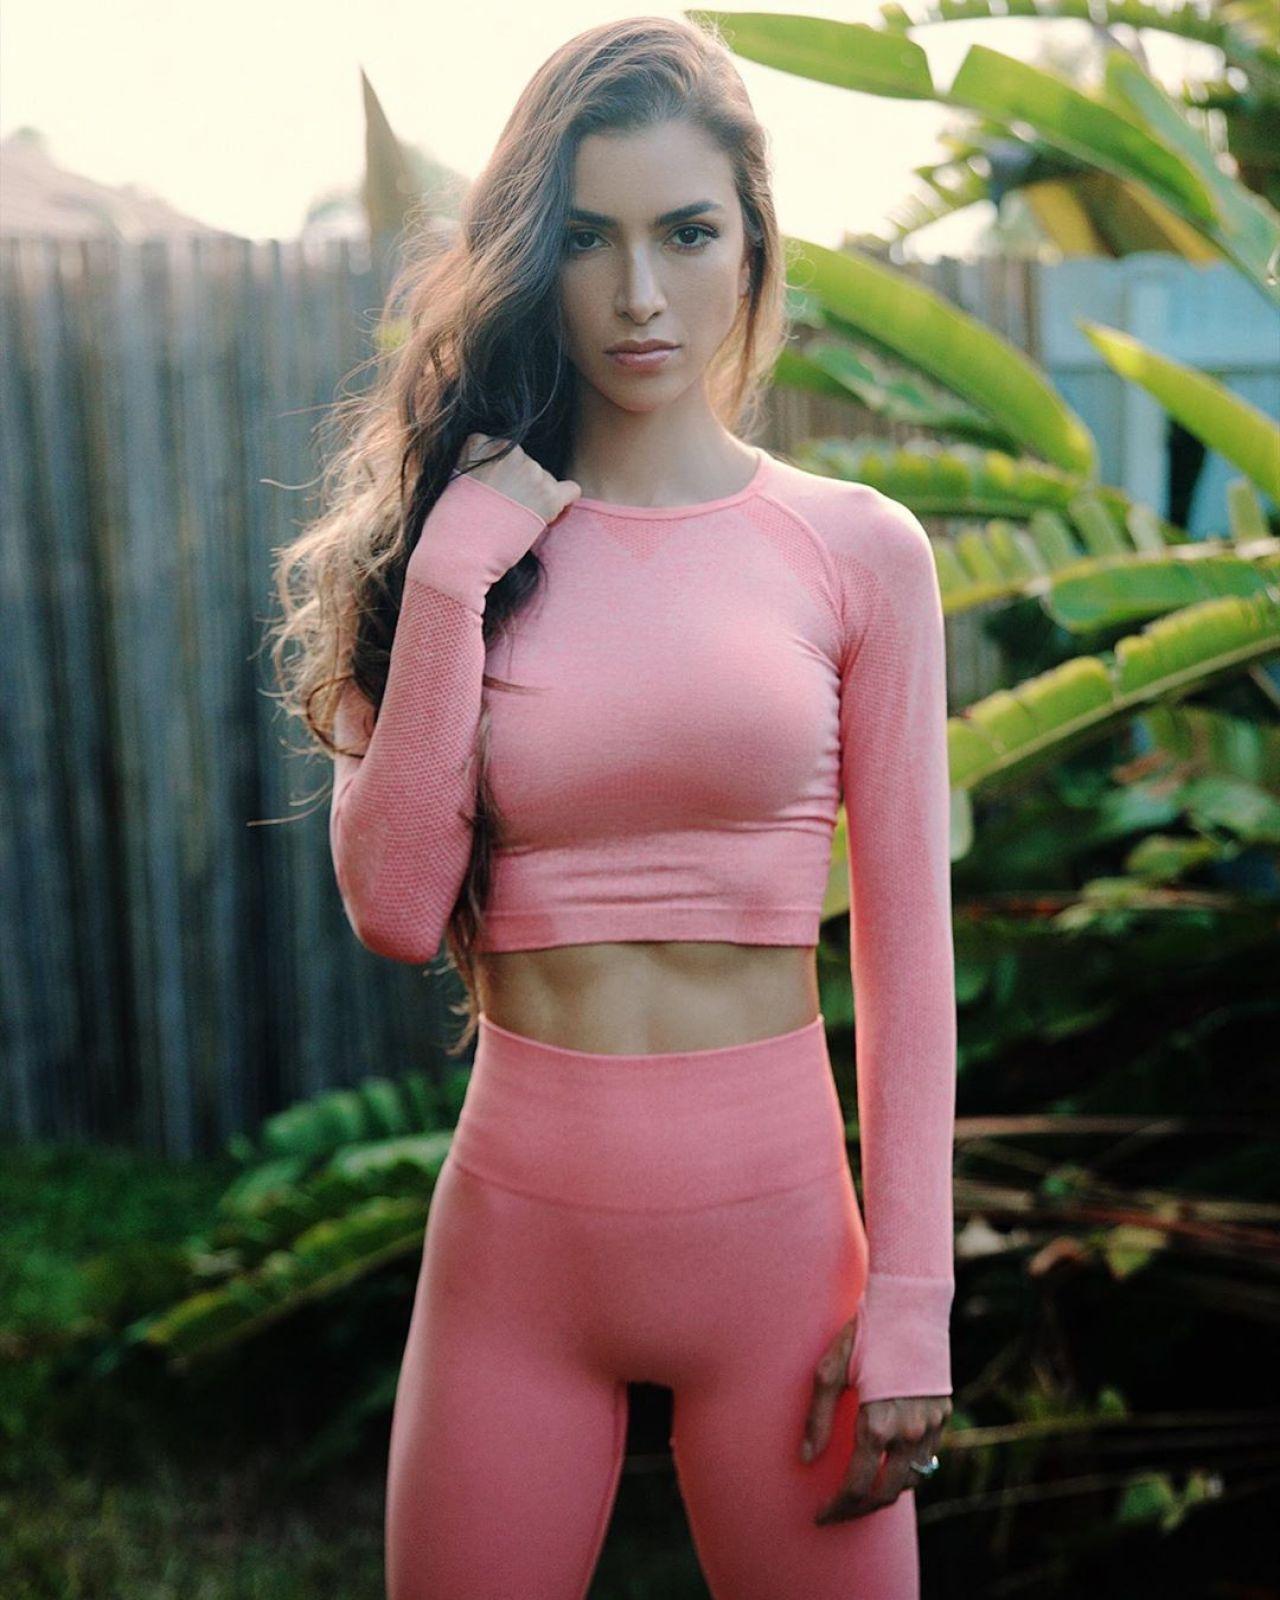 Model Anllela Sagra Wiki, Bio, Age, Height, Weight, Career